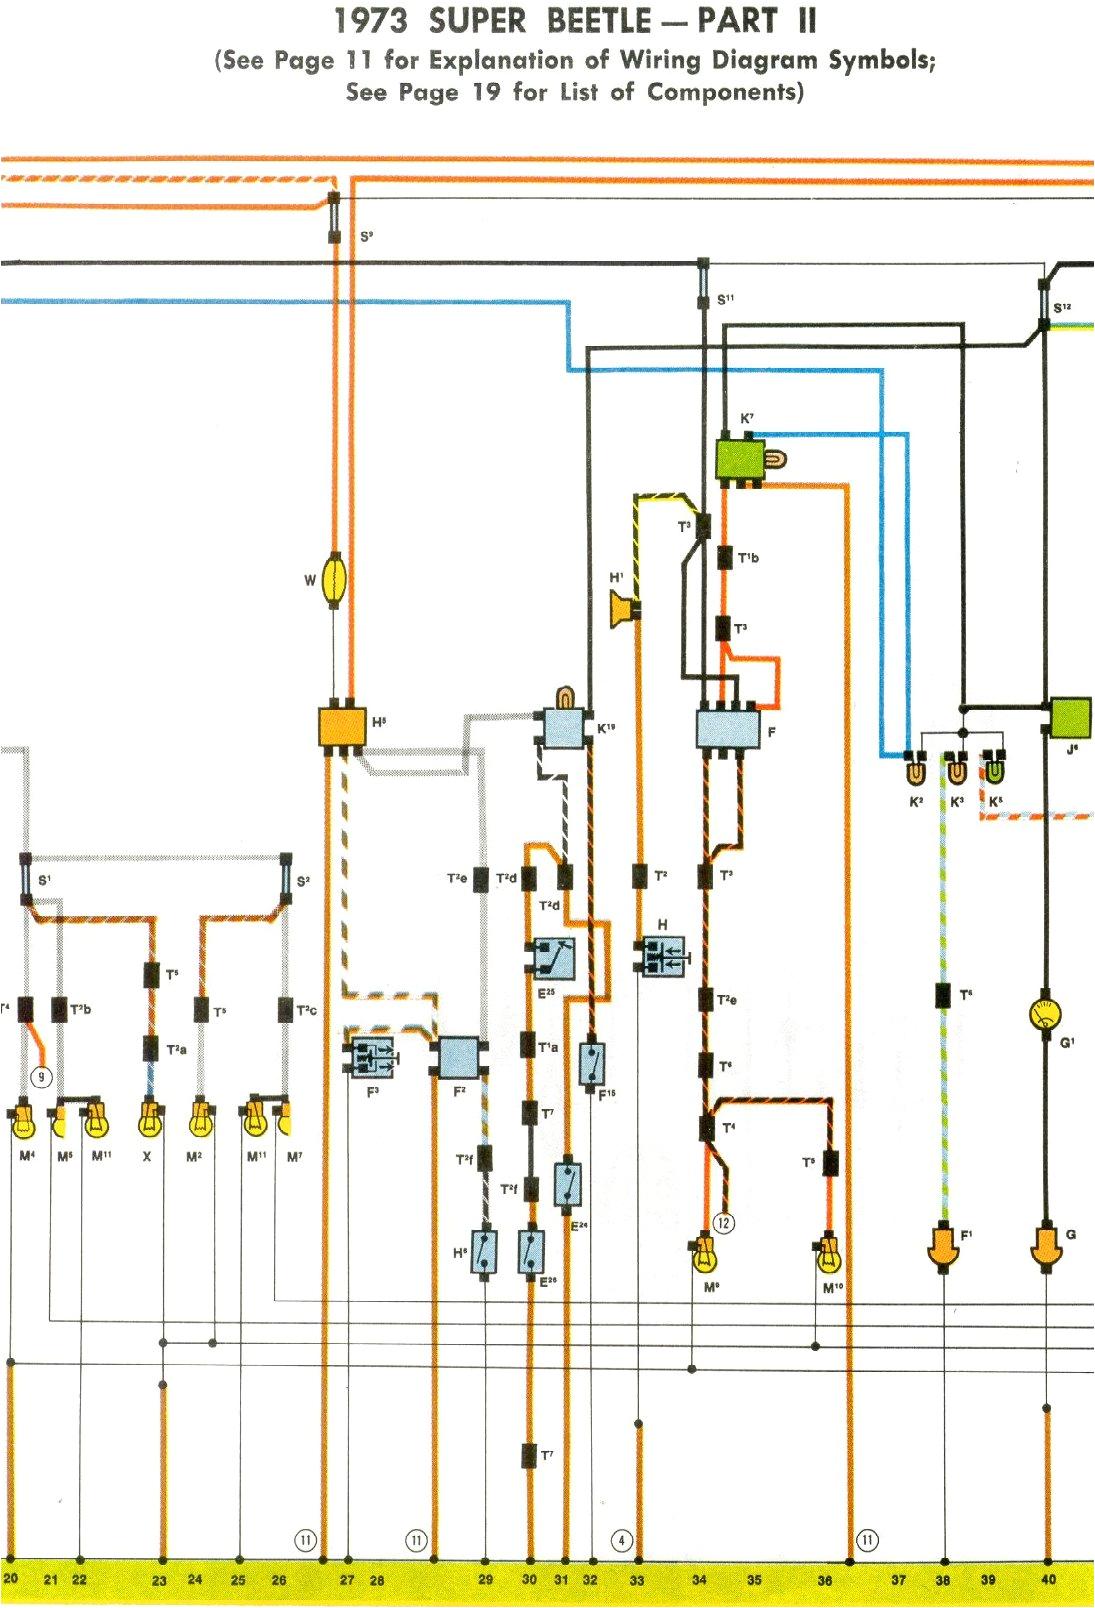 1973 super beetle wiring diagram thegoldenbug com wiring diagram vw beetle 1973